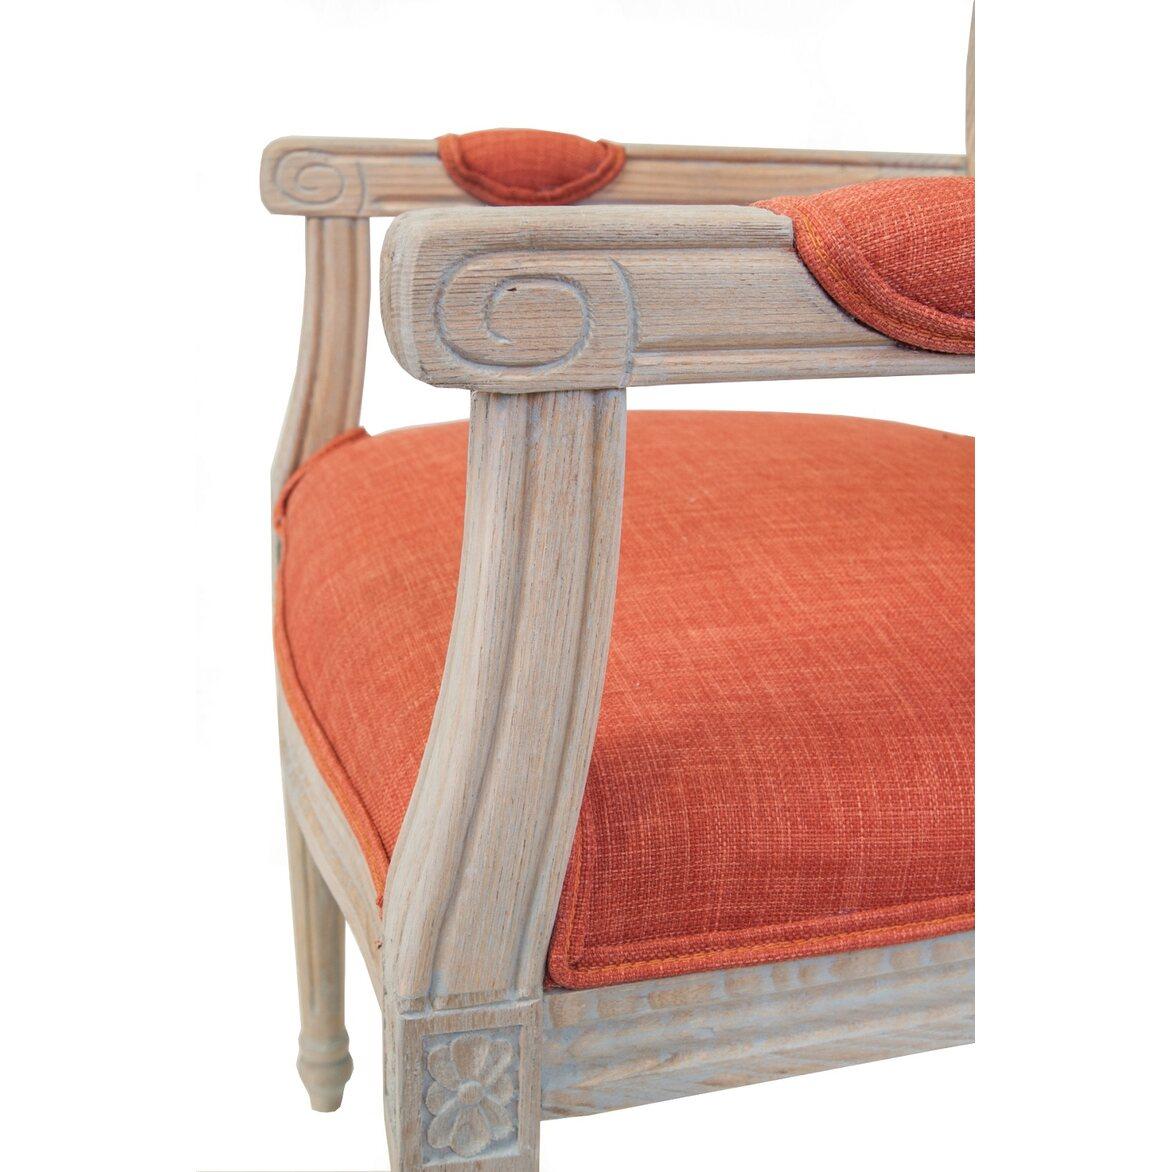 Стул Diella orange 5   Обеденные стулья Kingsby